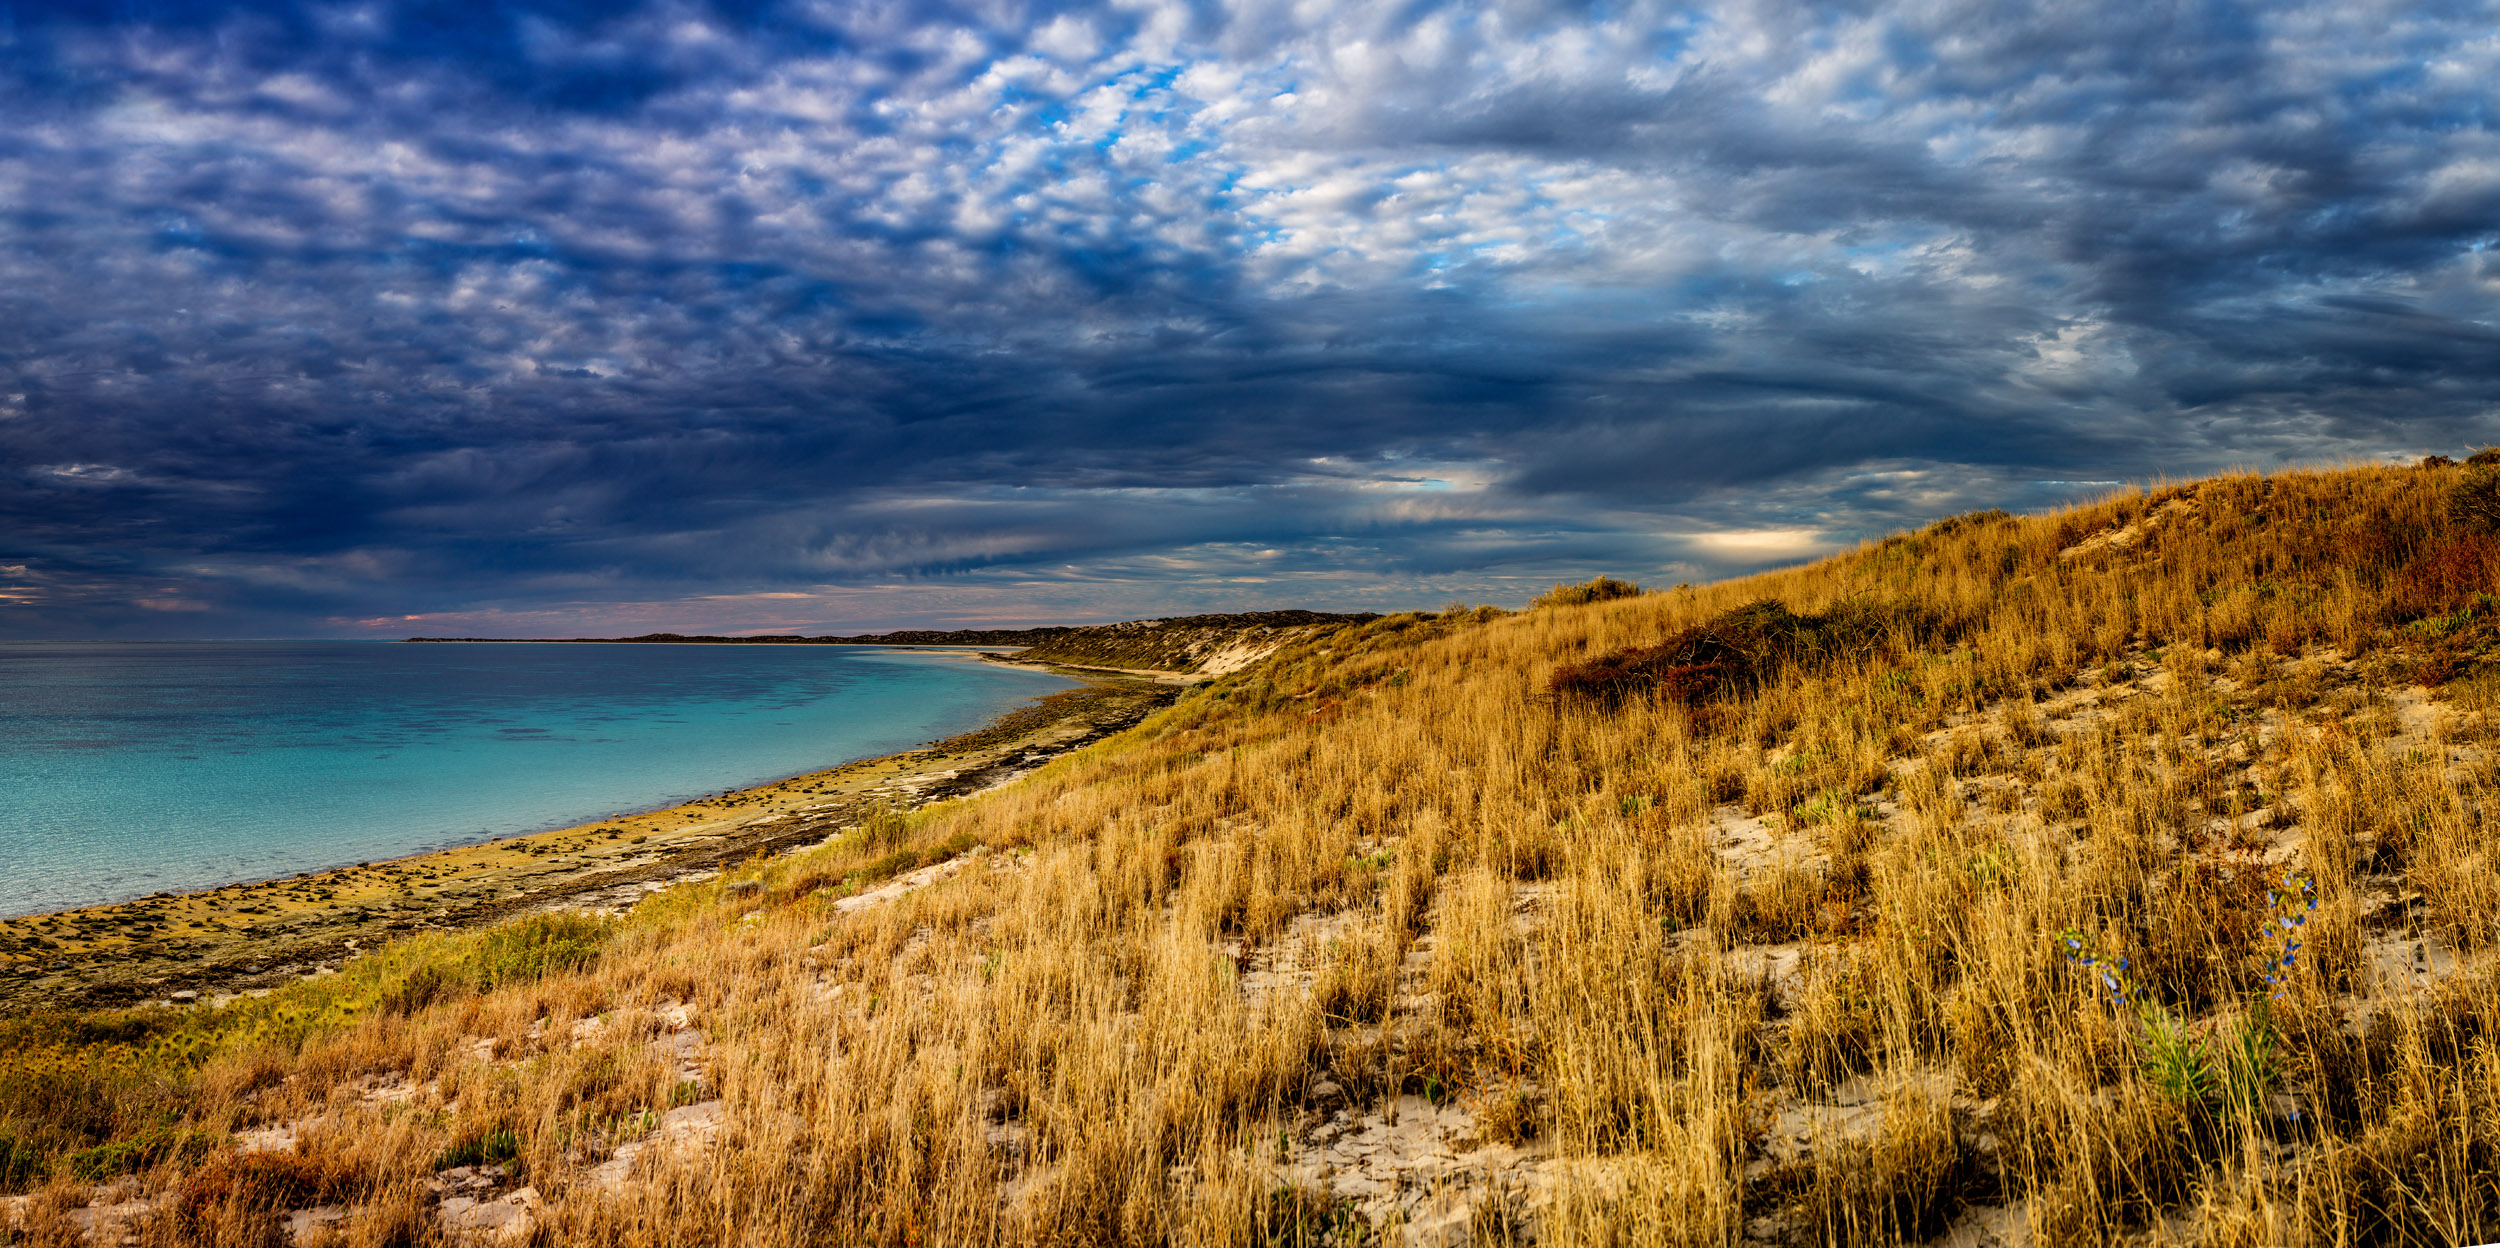 coral-bay-landscape-Pano.jpg